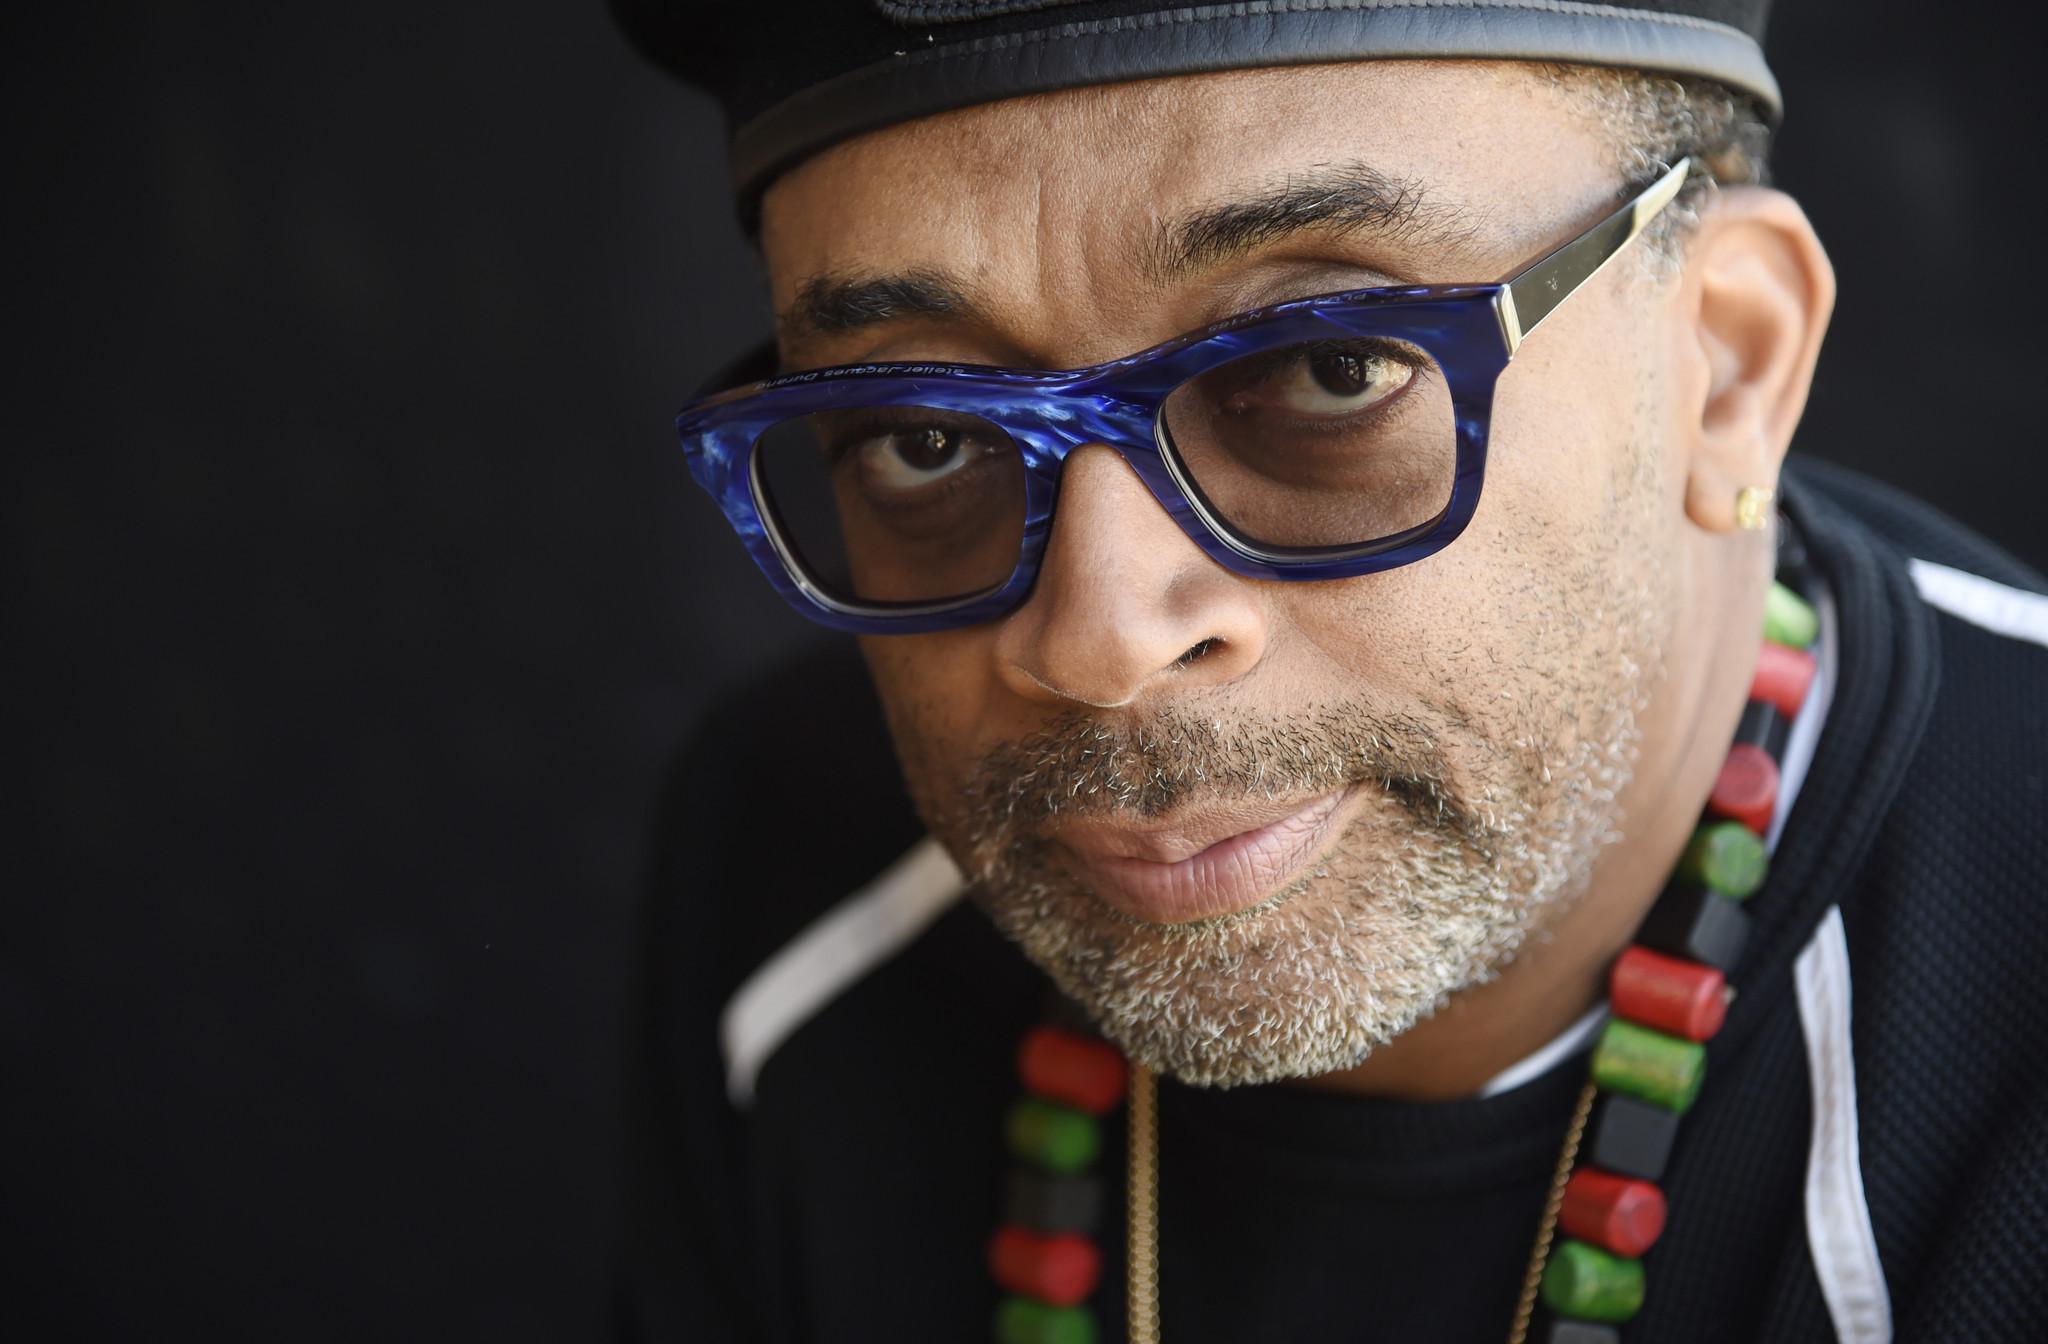 c008679f2630 Director Spike Lee boycotts Gucci